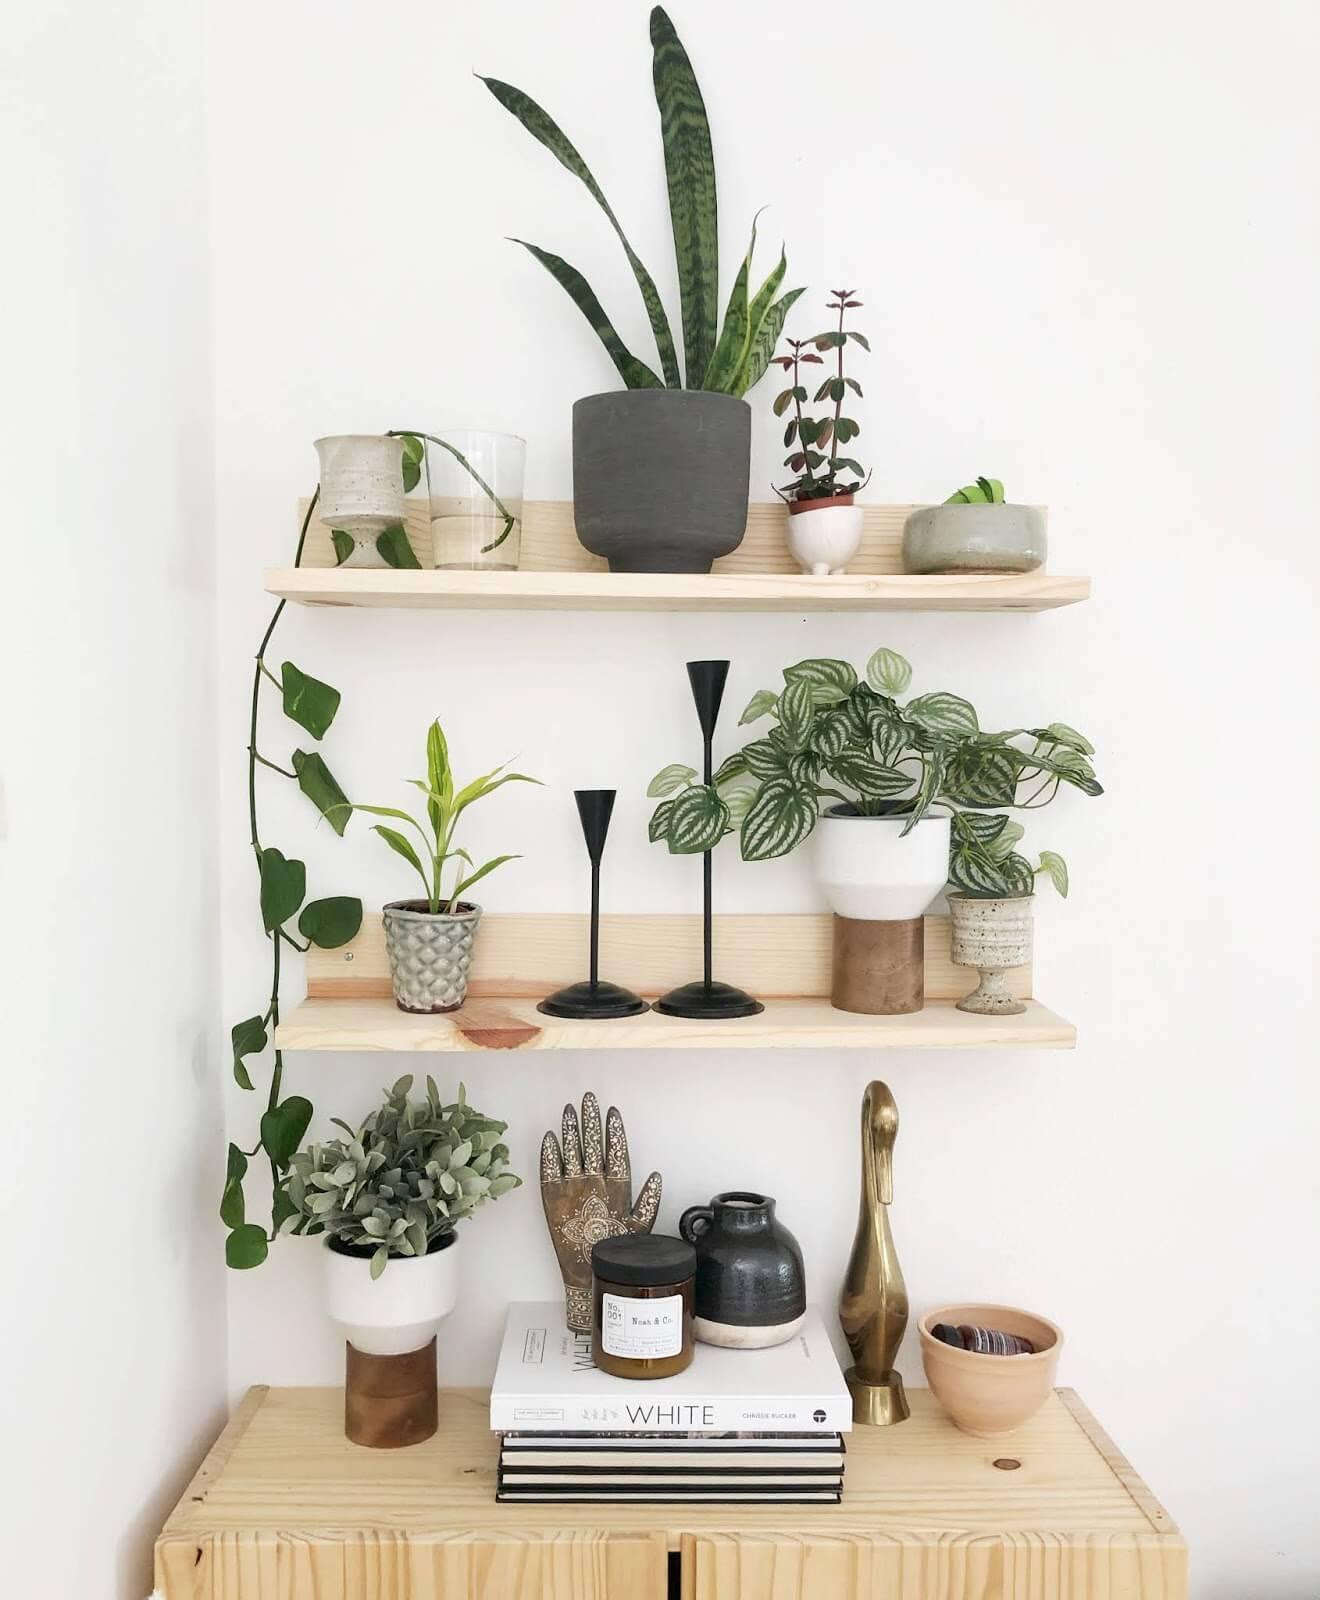 Bedroom organization ideas floating shelves